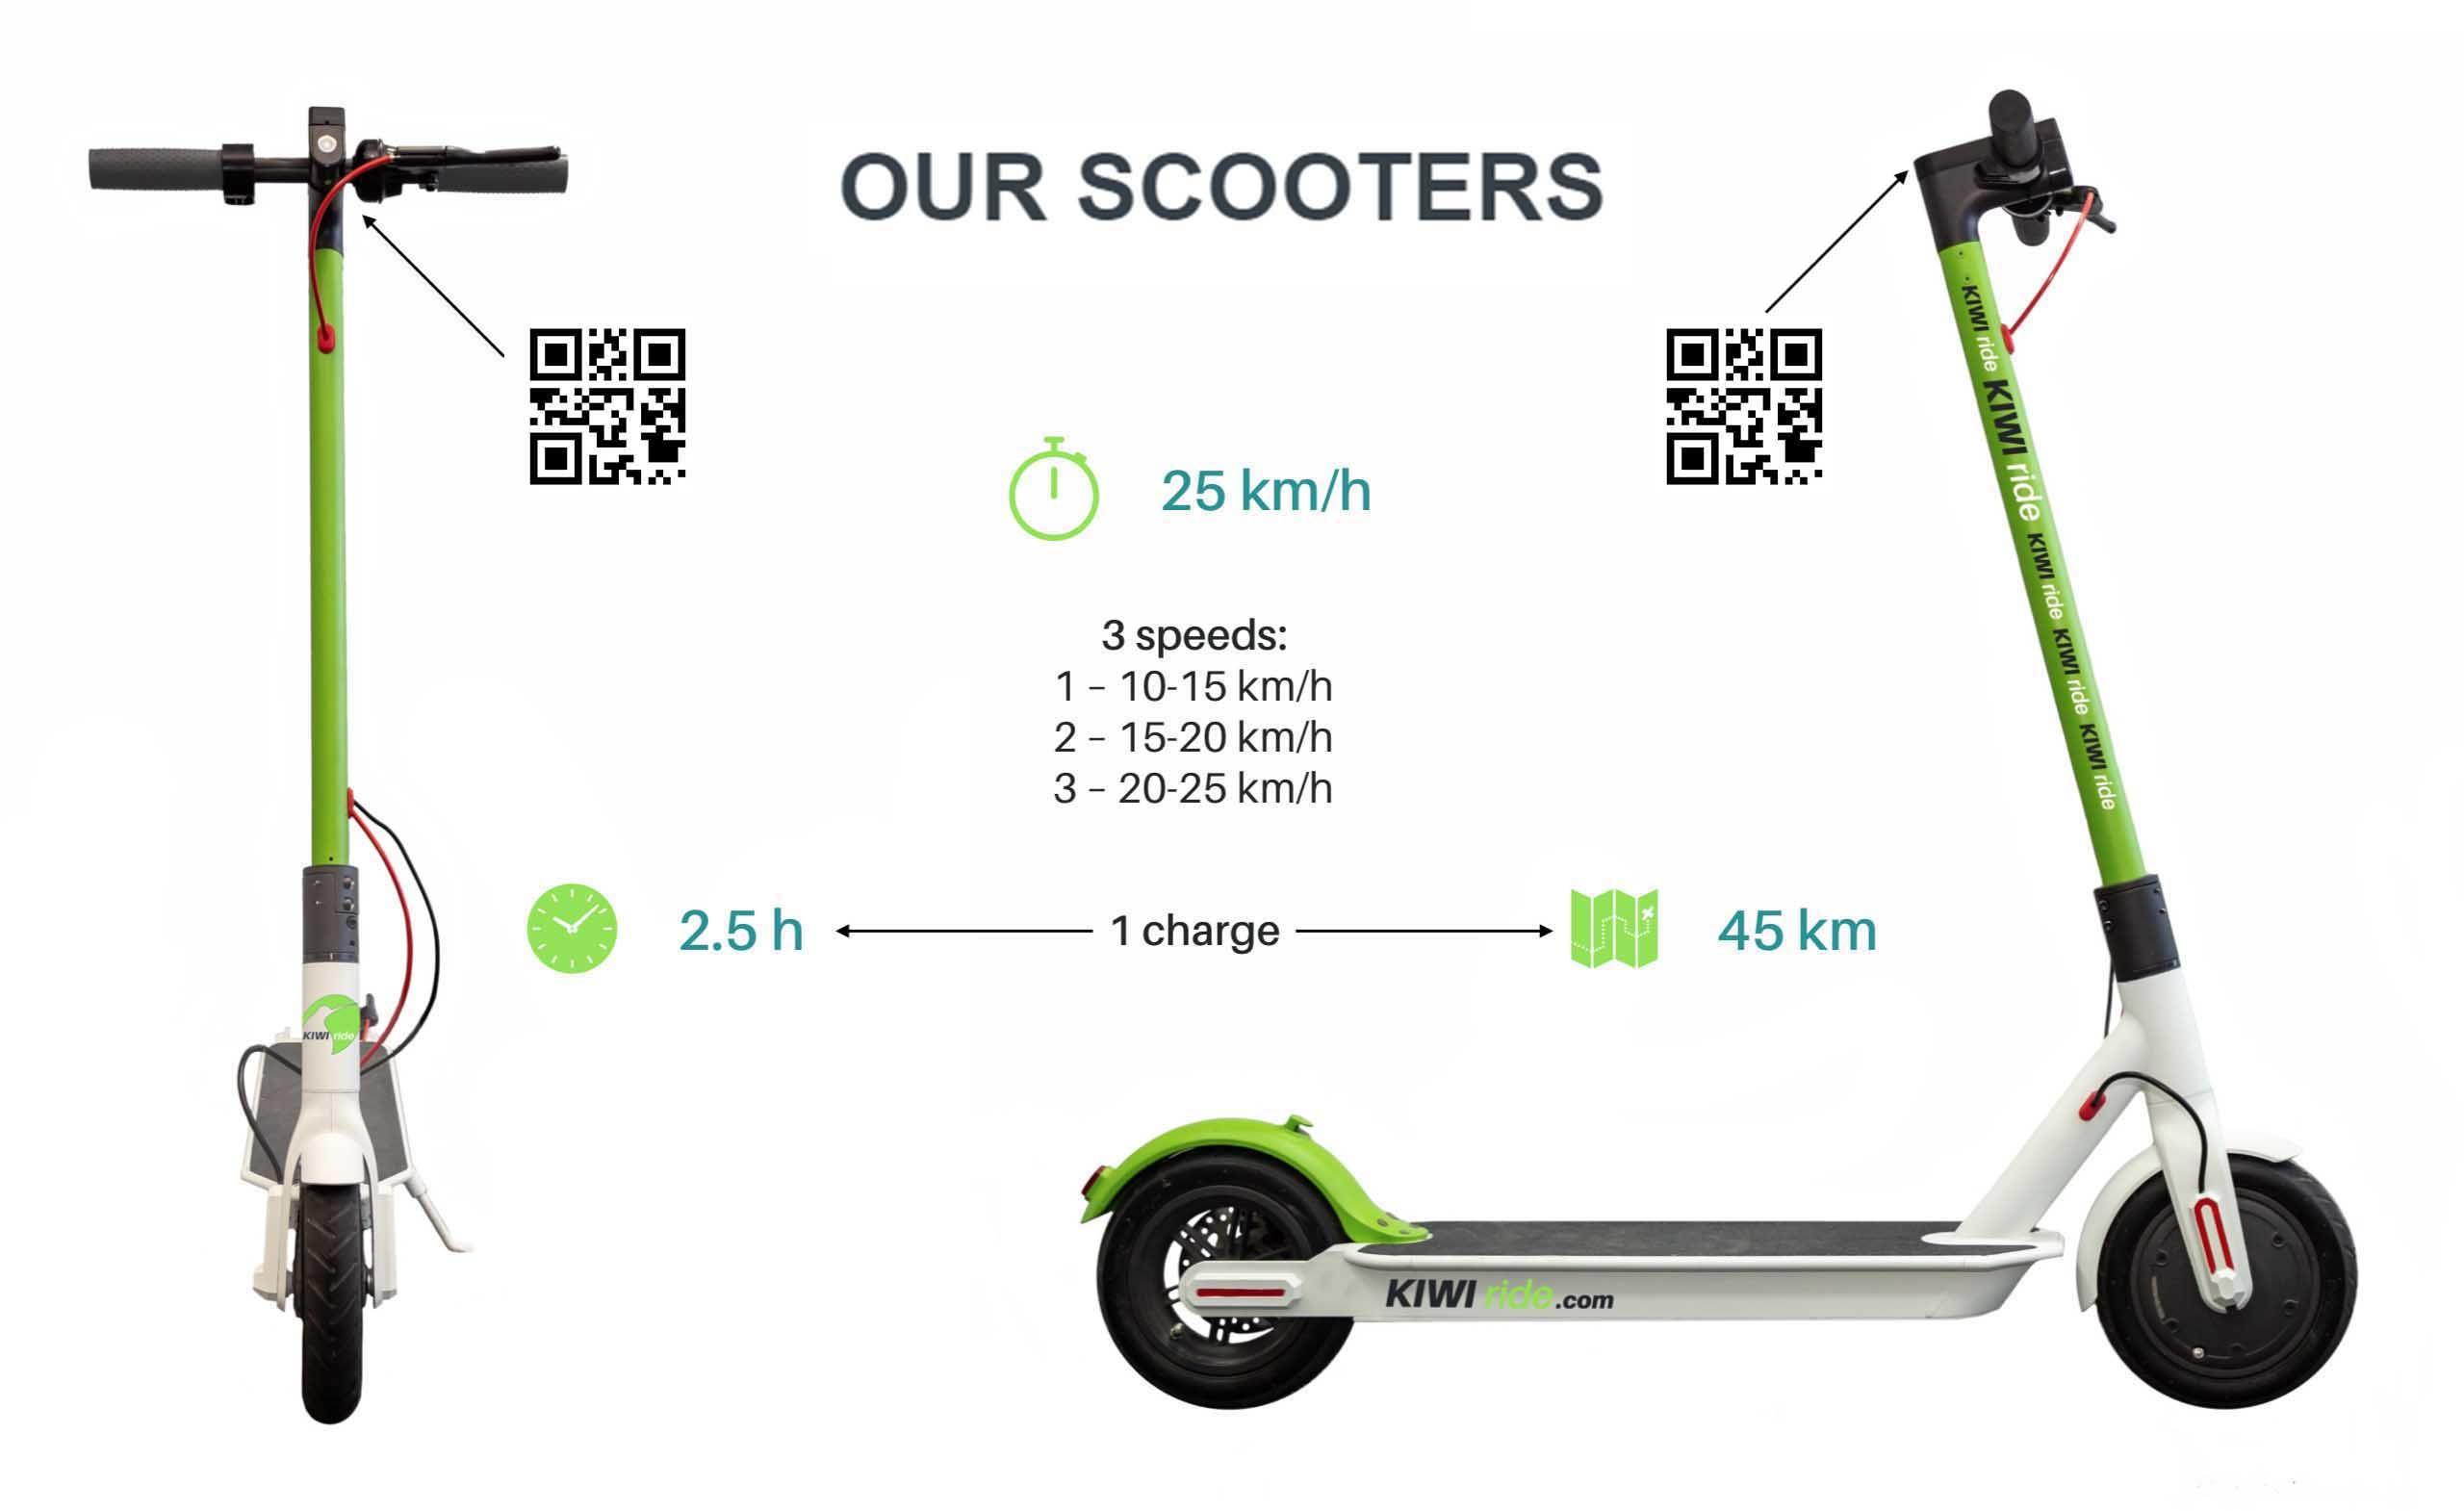 Freiminuten - Neuer Scooter Anbieter KIWI in Wien